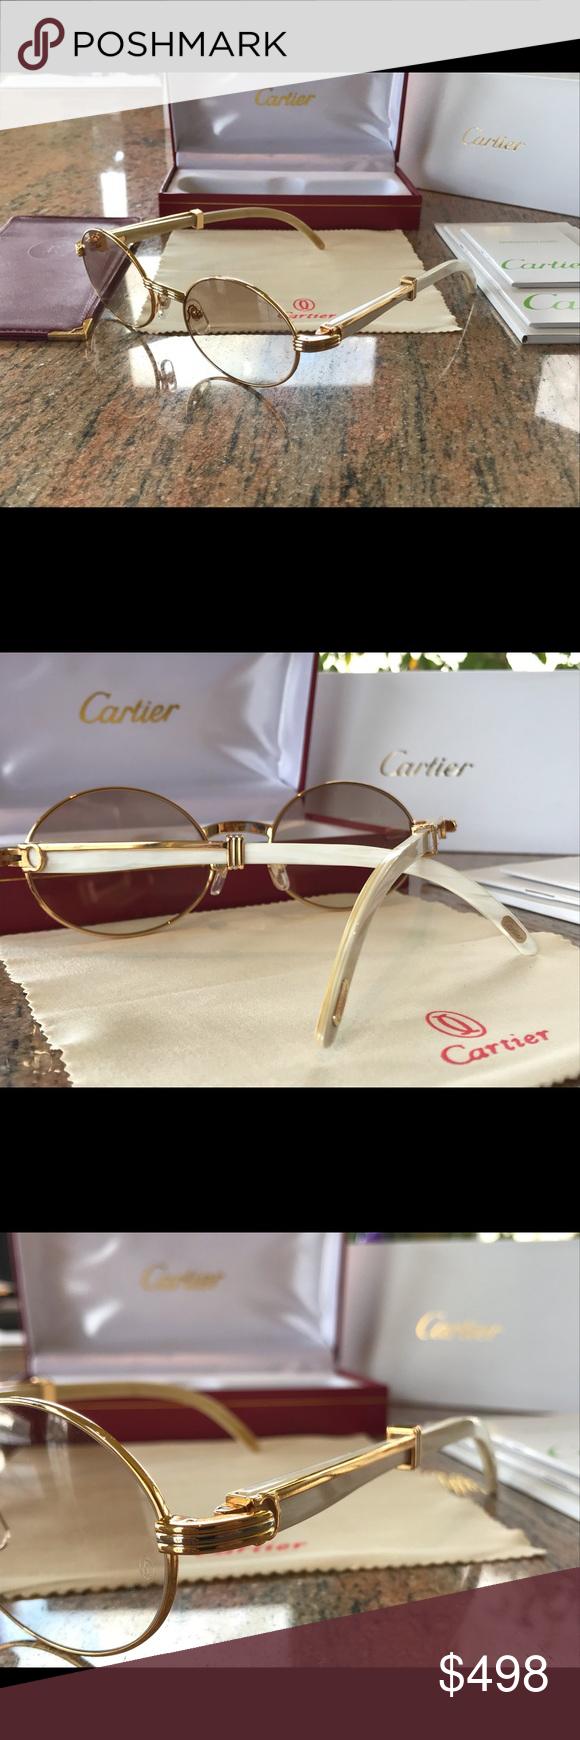 "212eb83fdee Cartier White Horn Gold Sun Glasses Cartier White Buffalo Horn Gold "" Sunglasses"